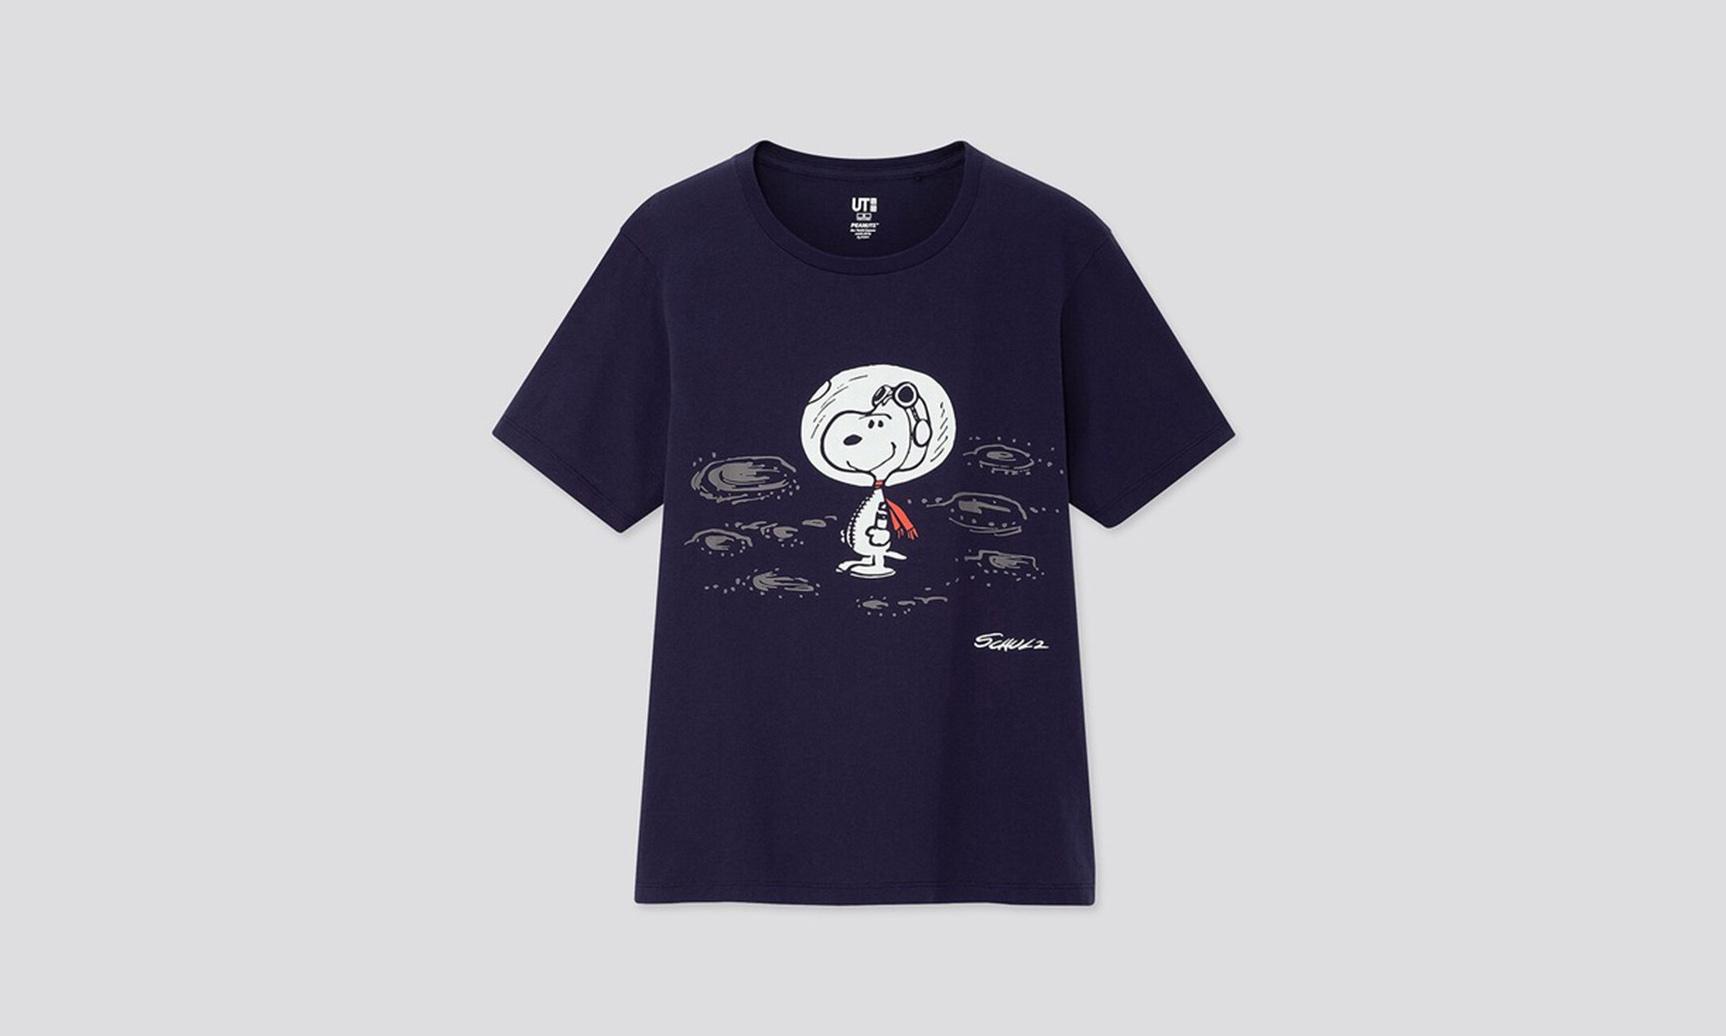 庆祝《PEANUTS》70 周年,UNIQLO 推出 Snoopy 联乘 T 恤系列